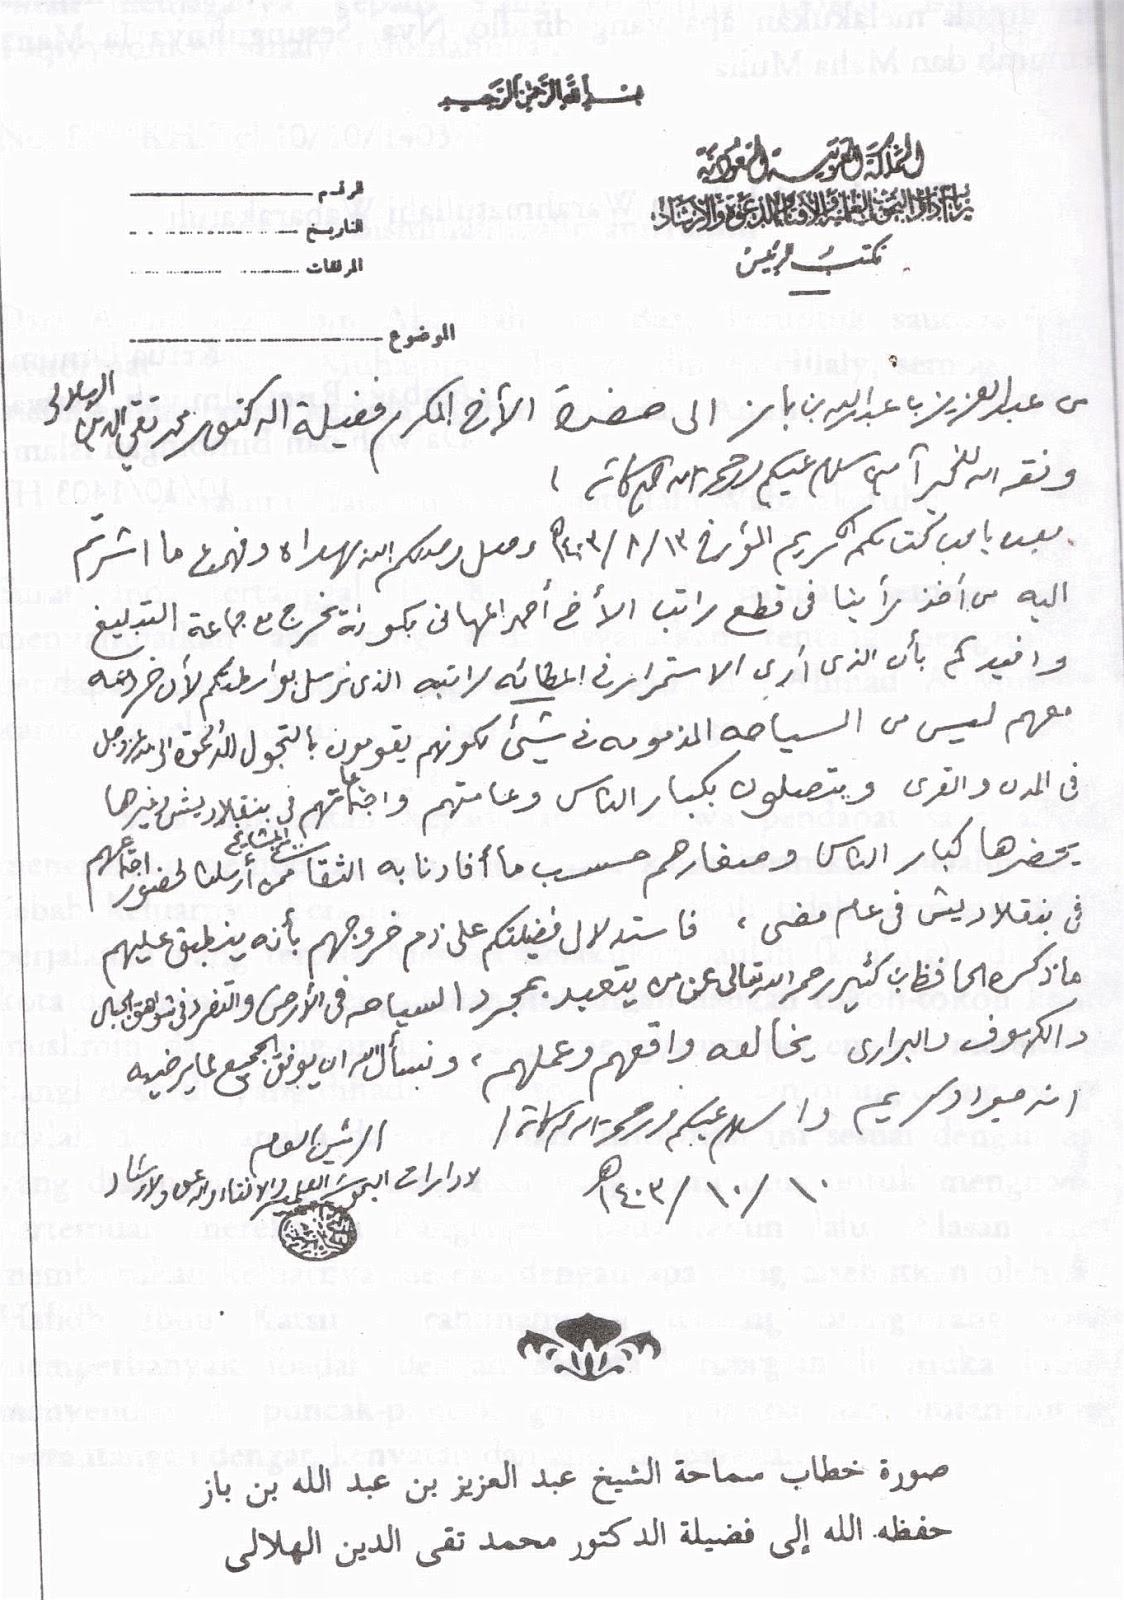 The Letter Of Sheikh Abdul Aziz Bin Abdullah Baz Rahimahullah To Dr Muhammad Taqiyyudin Al Hilaly